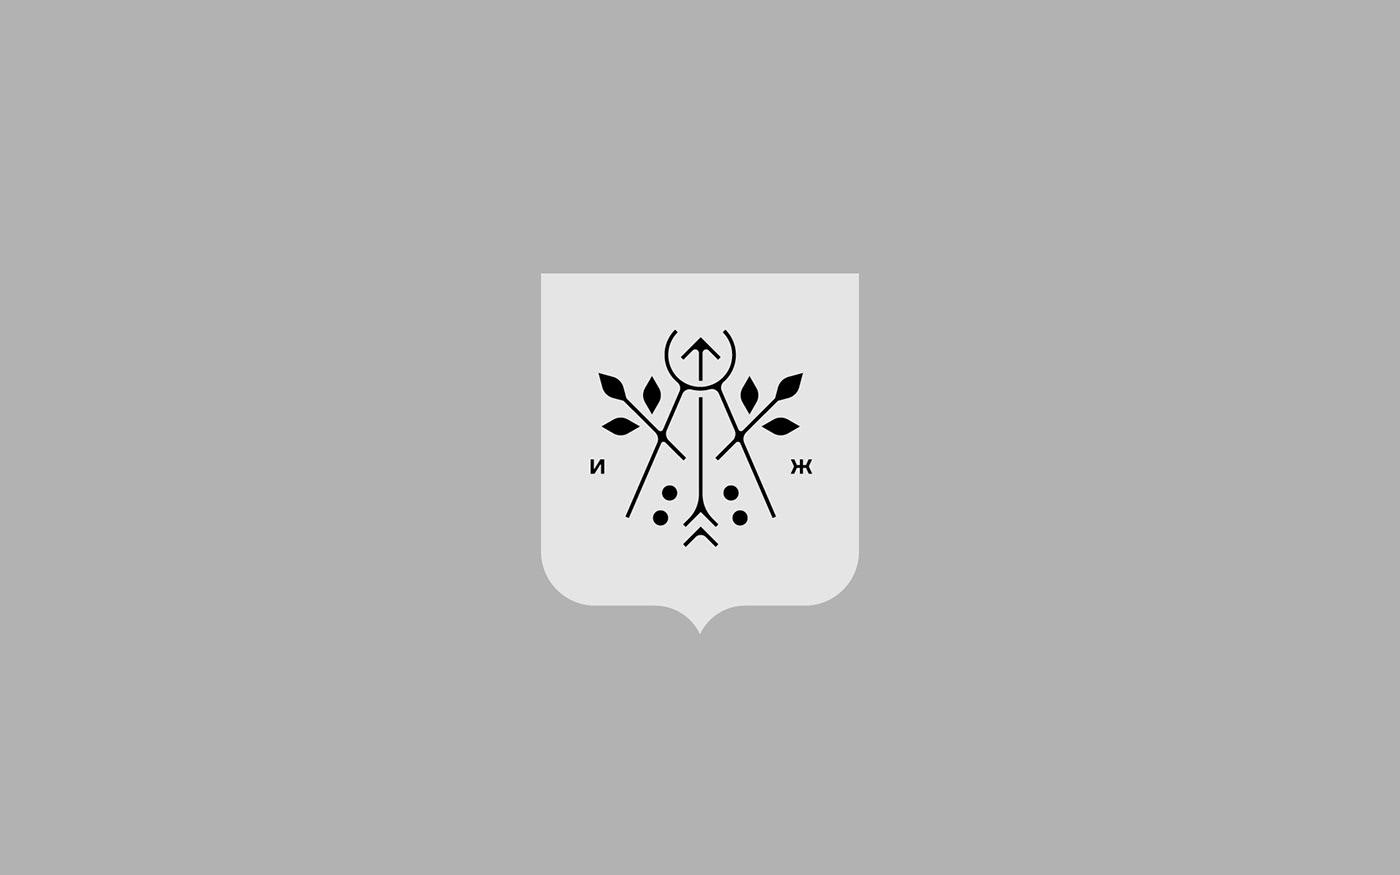 arrow city coat of arms geometry izhevsk Logotype Rowan shield Udmurtia